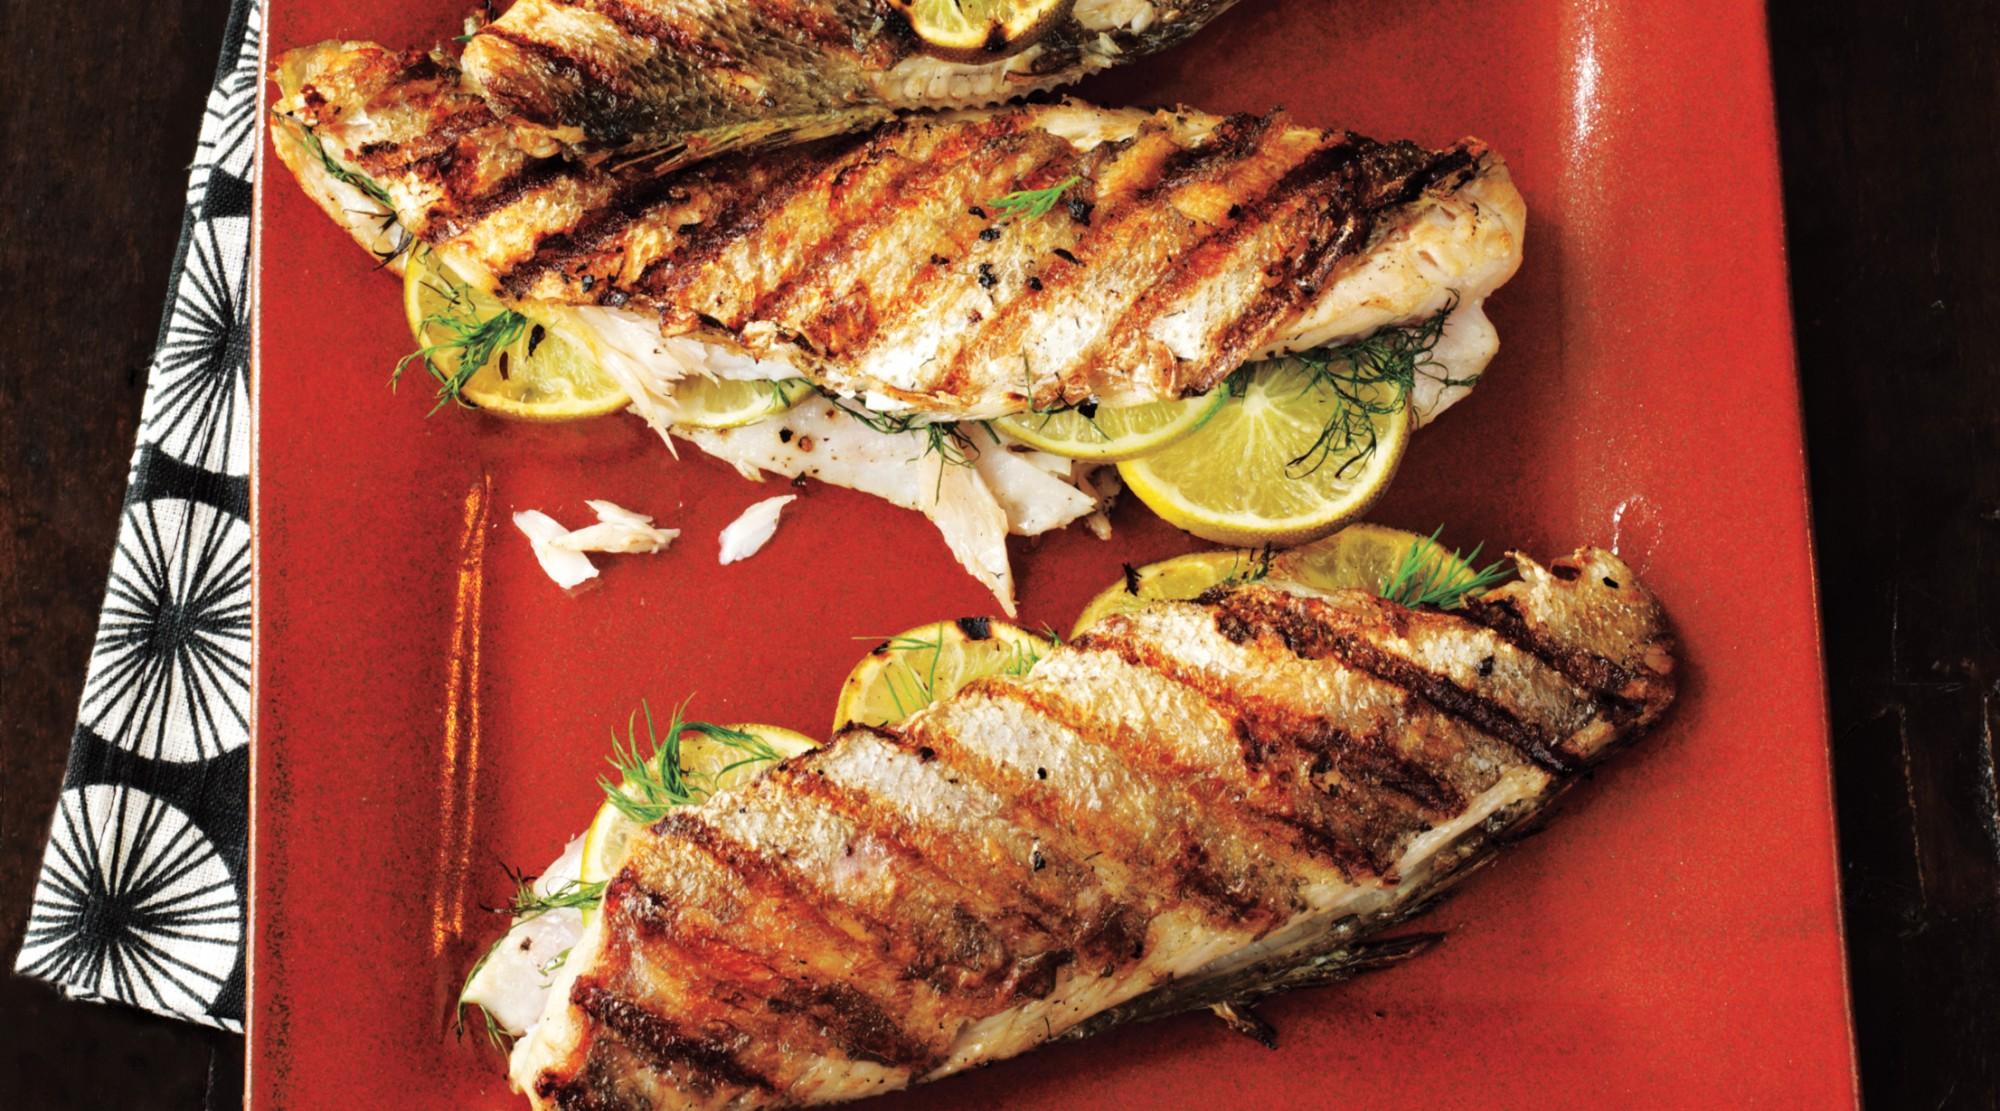 Trout fish barbecue photo